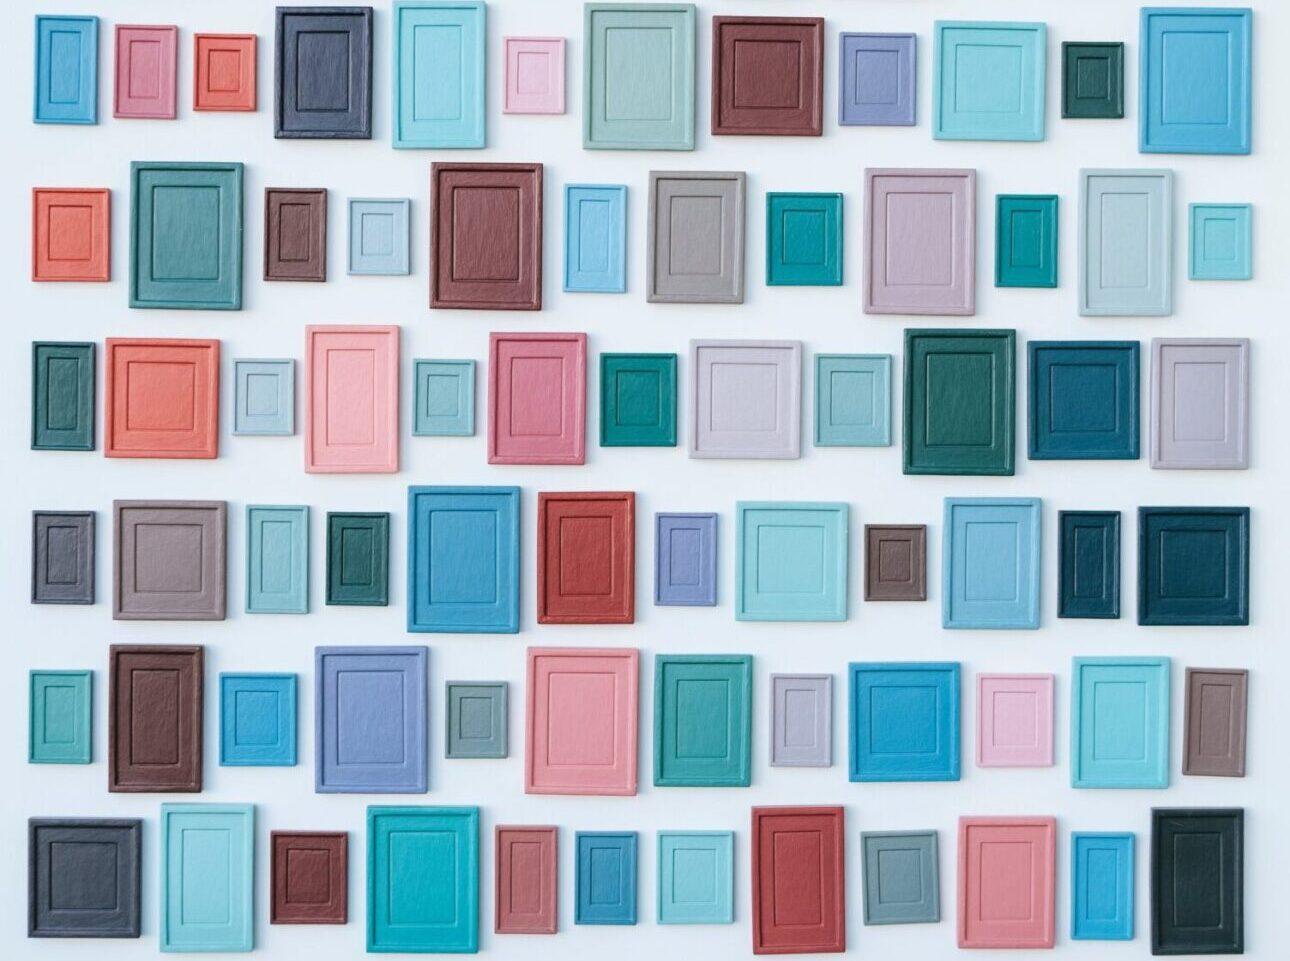 CORNICI COLORATE, frames